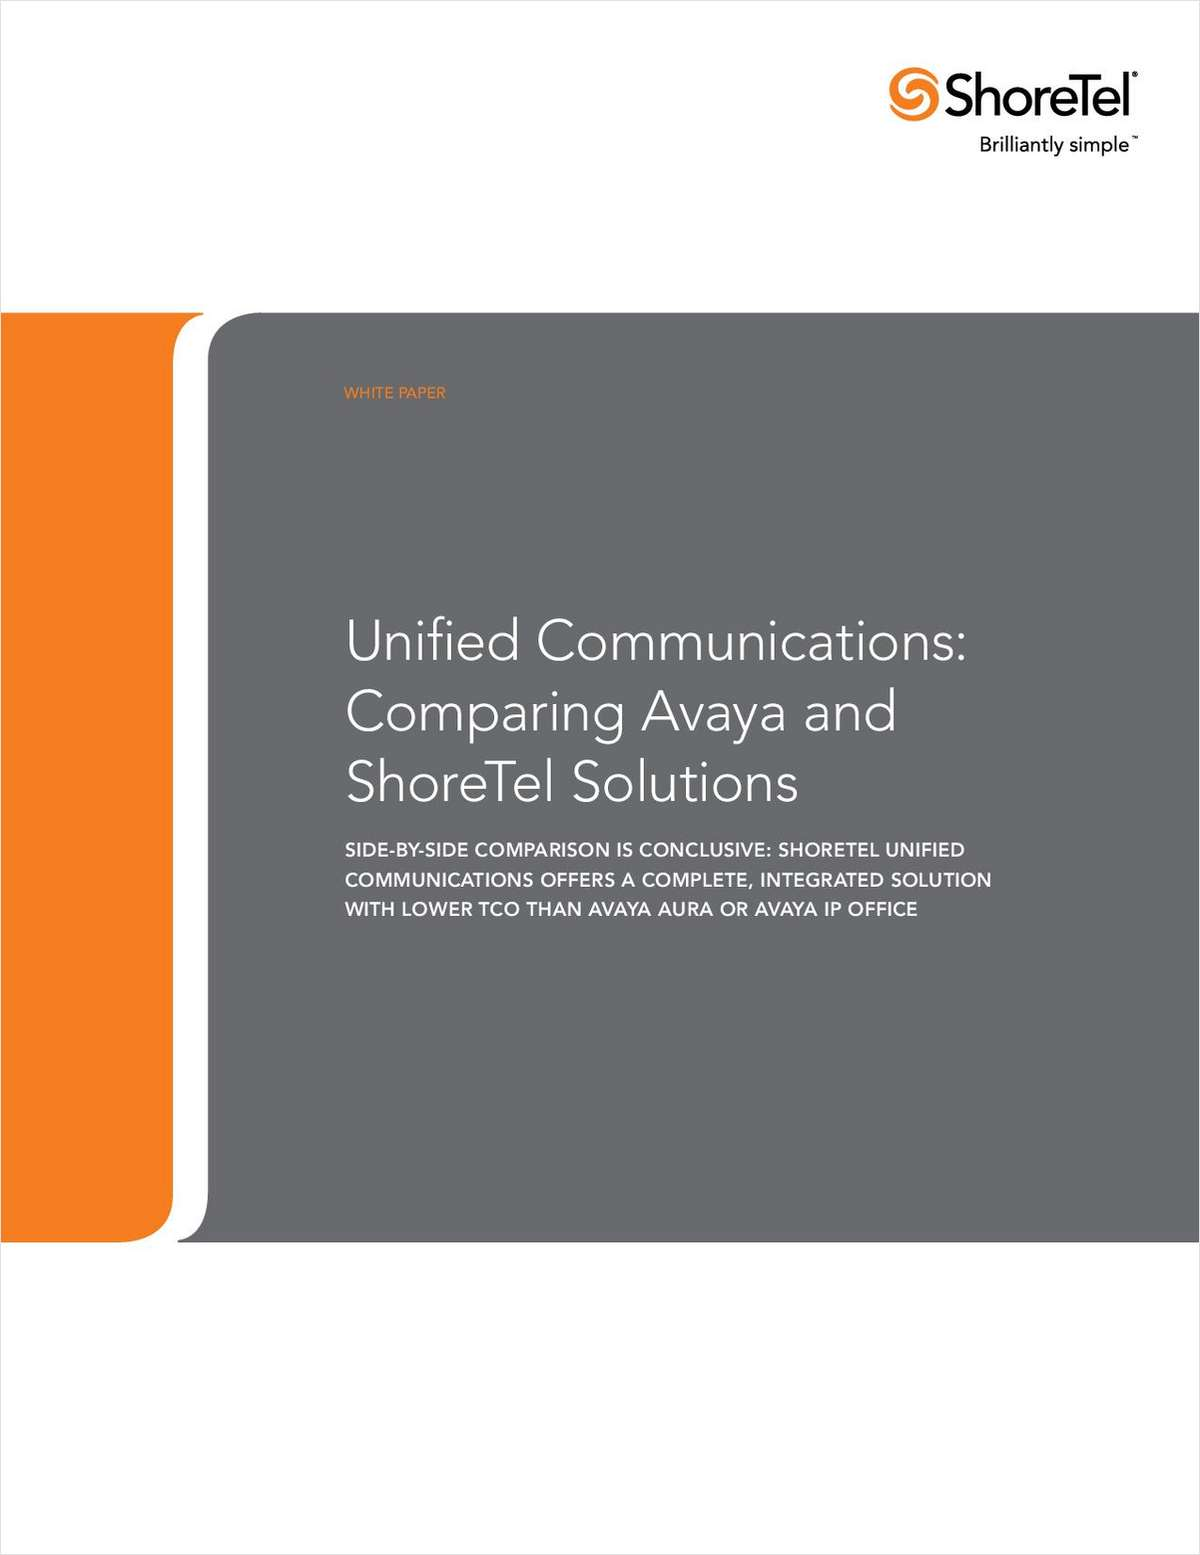 Comparison of Avaya and ShoreTel Unified Communication Solutions